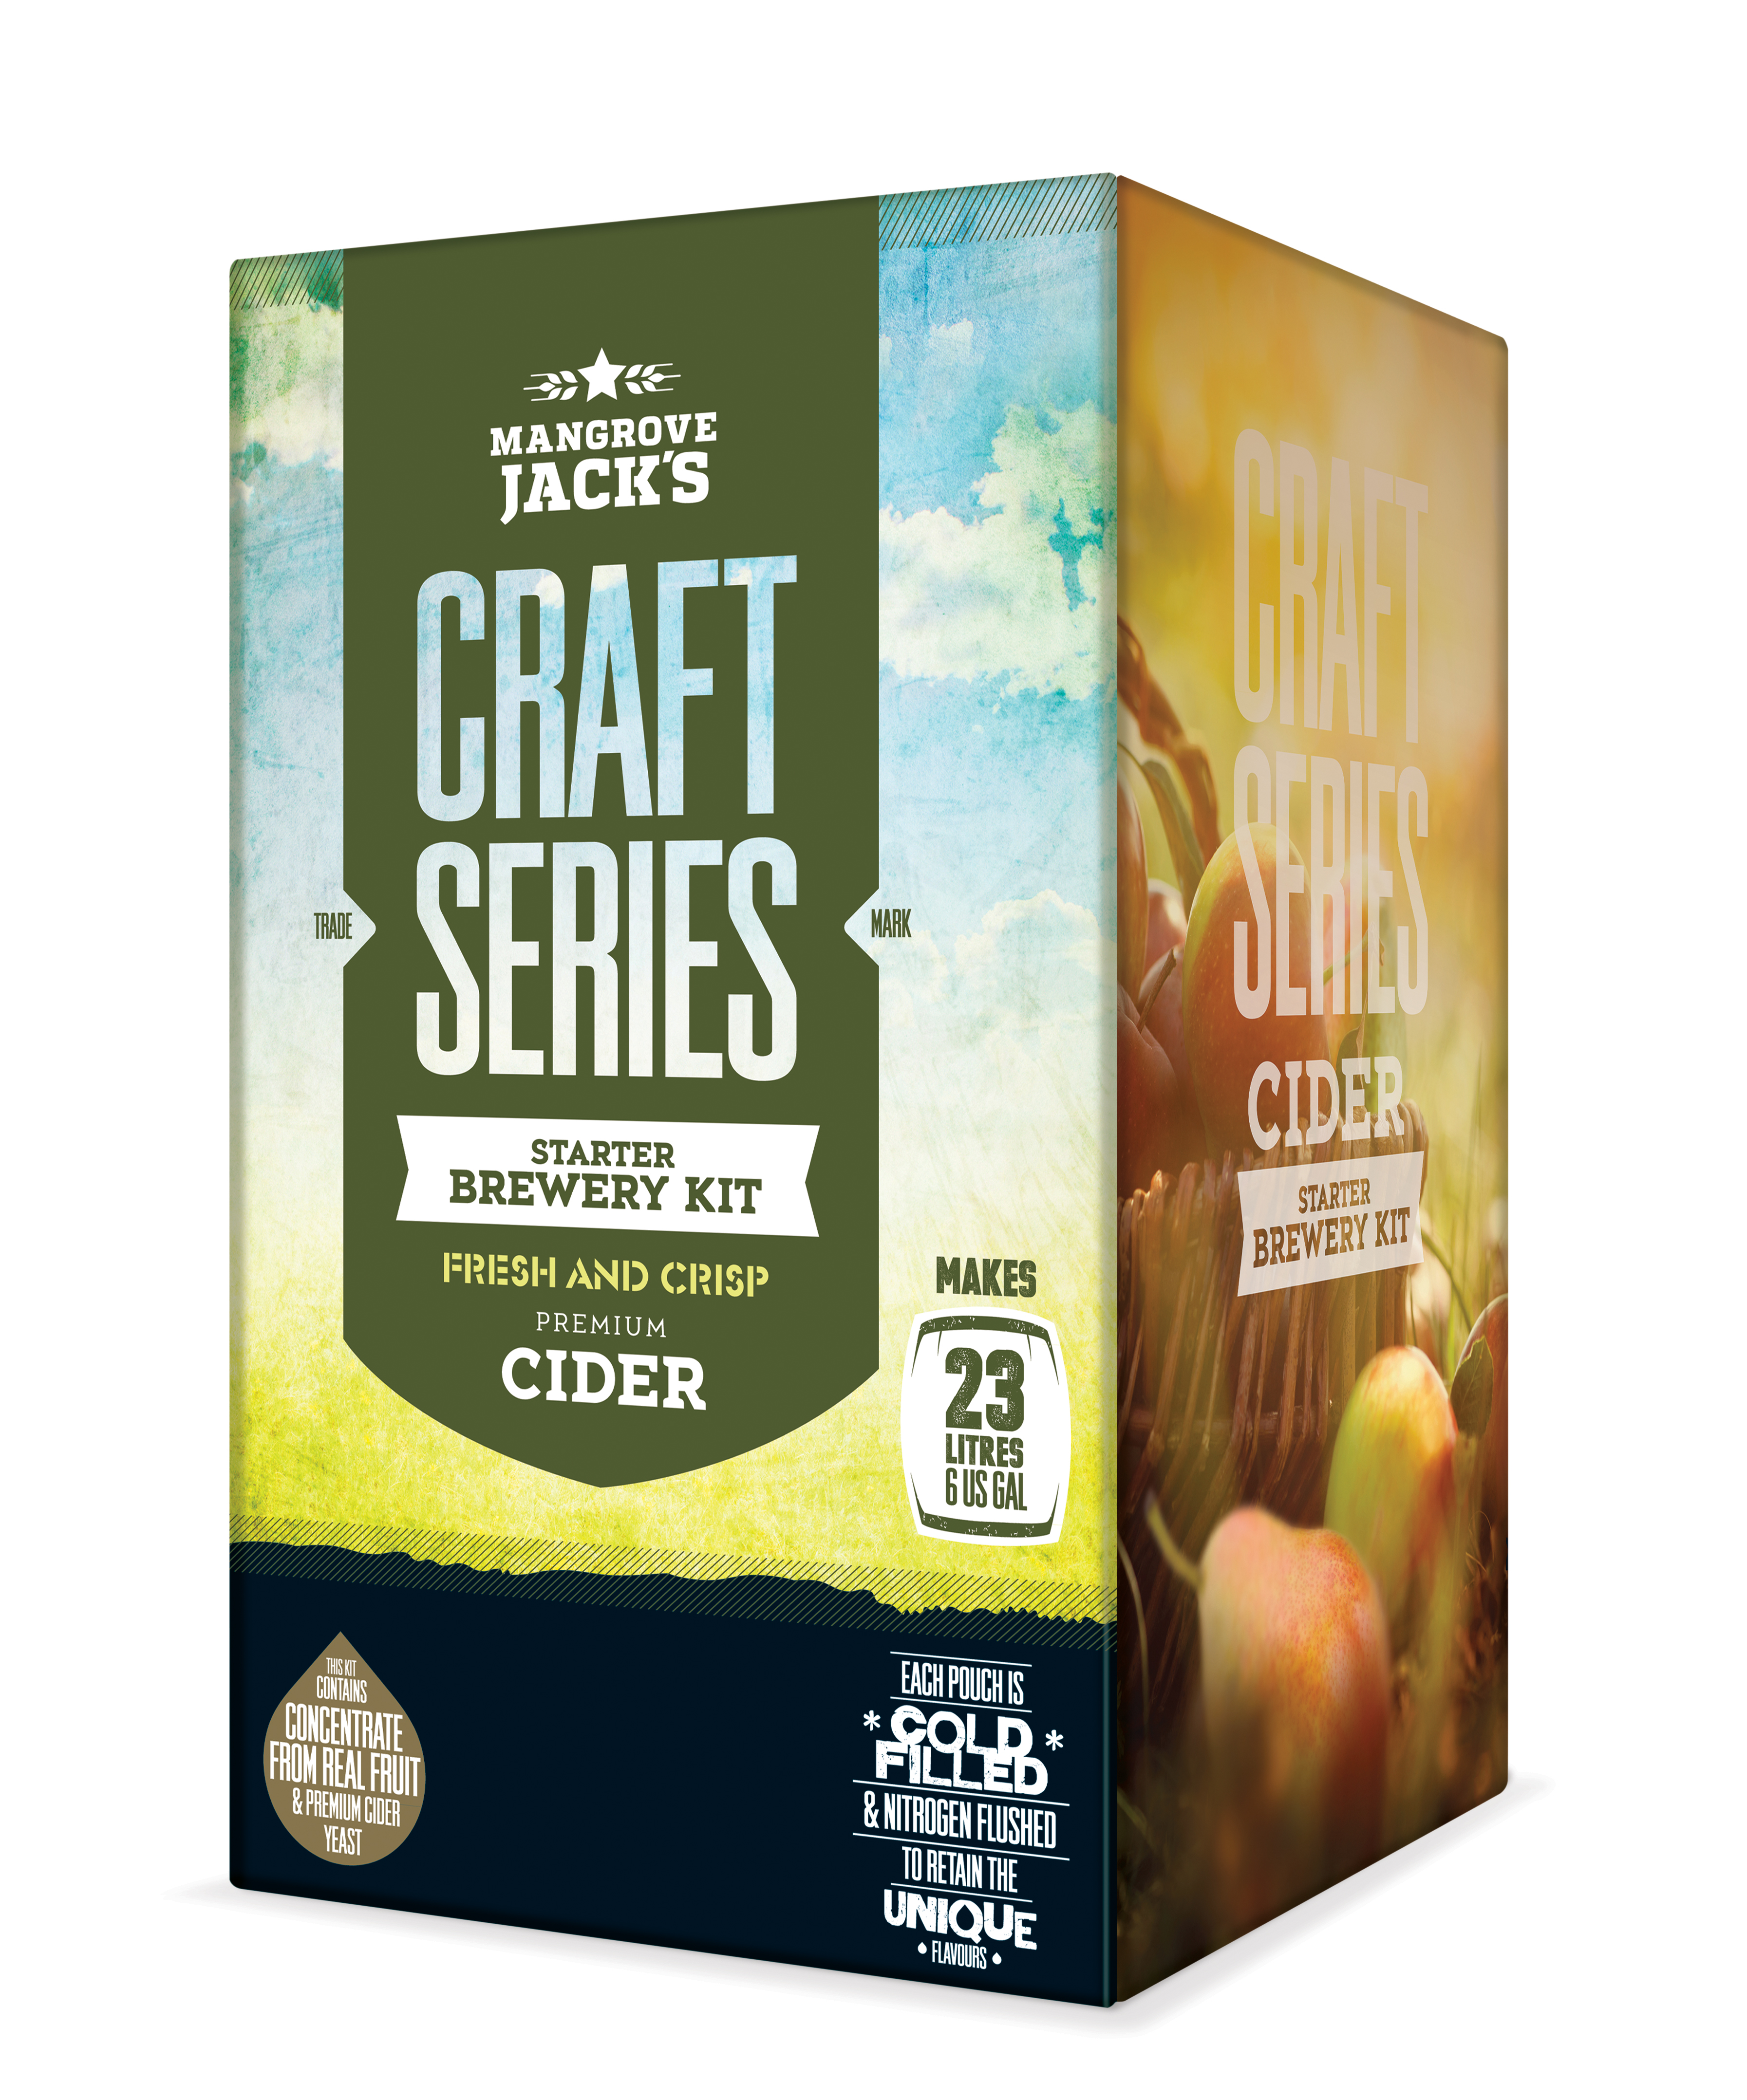 Mangrove Jack's Craft Series Apple Cider Starter Brewery Kit